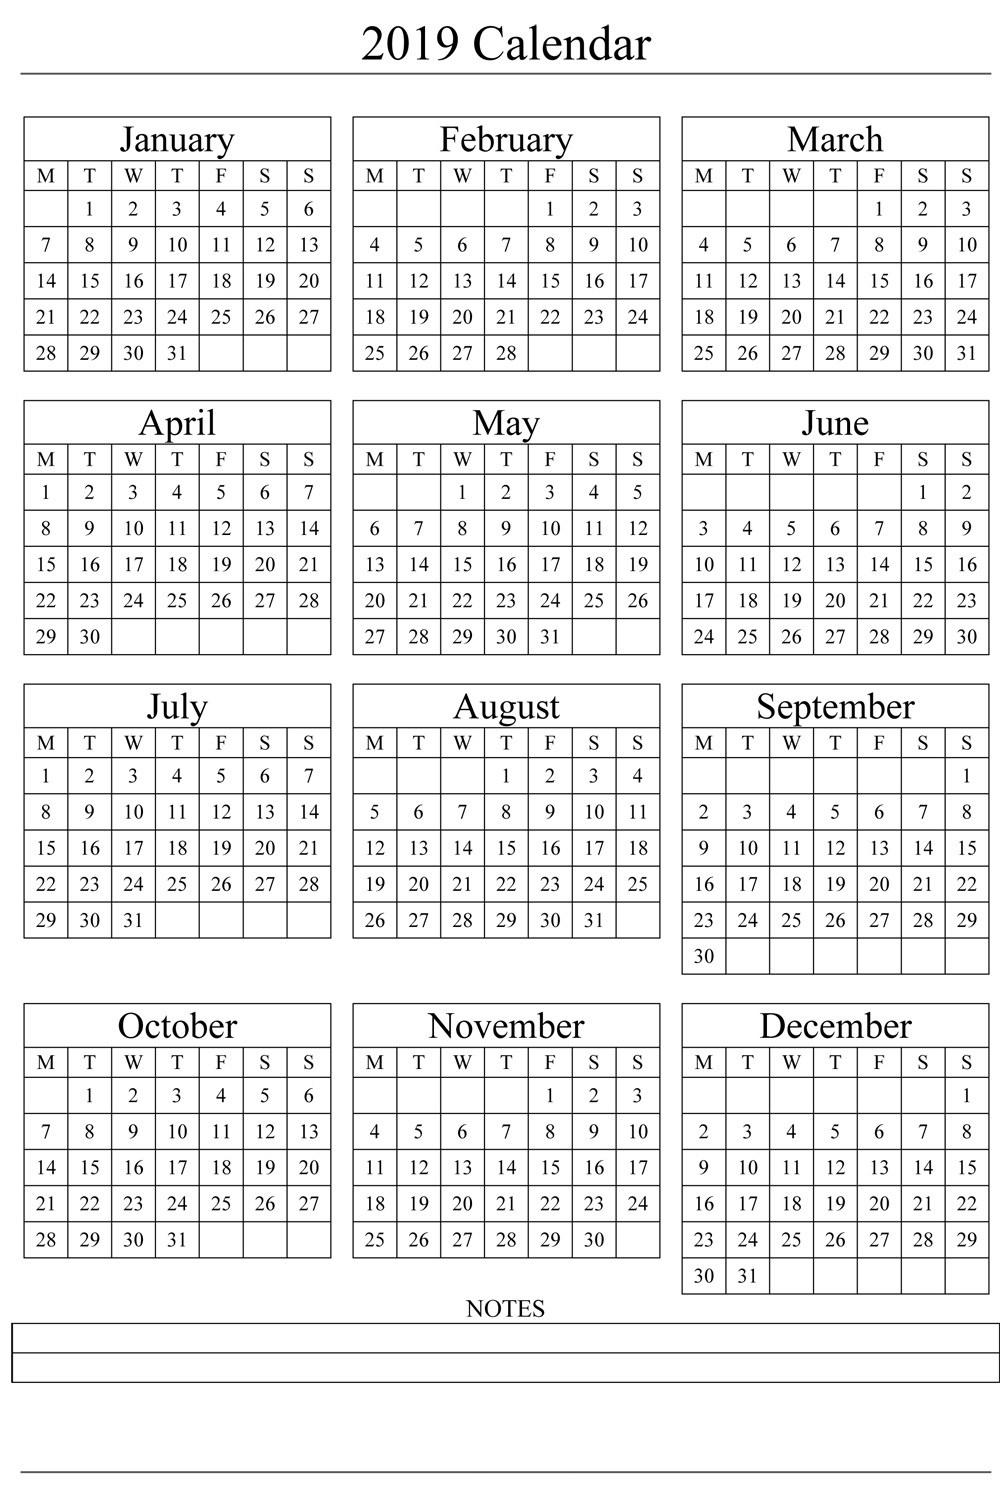 Www.istherewhitesmoke/g/006-Printable-Word-Cal intended for Word Calendar Template Excel